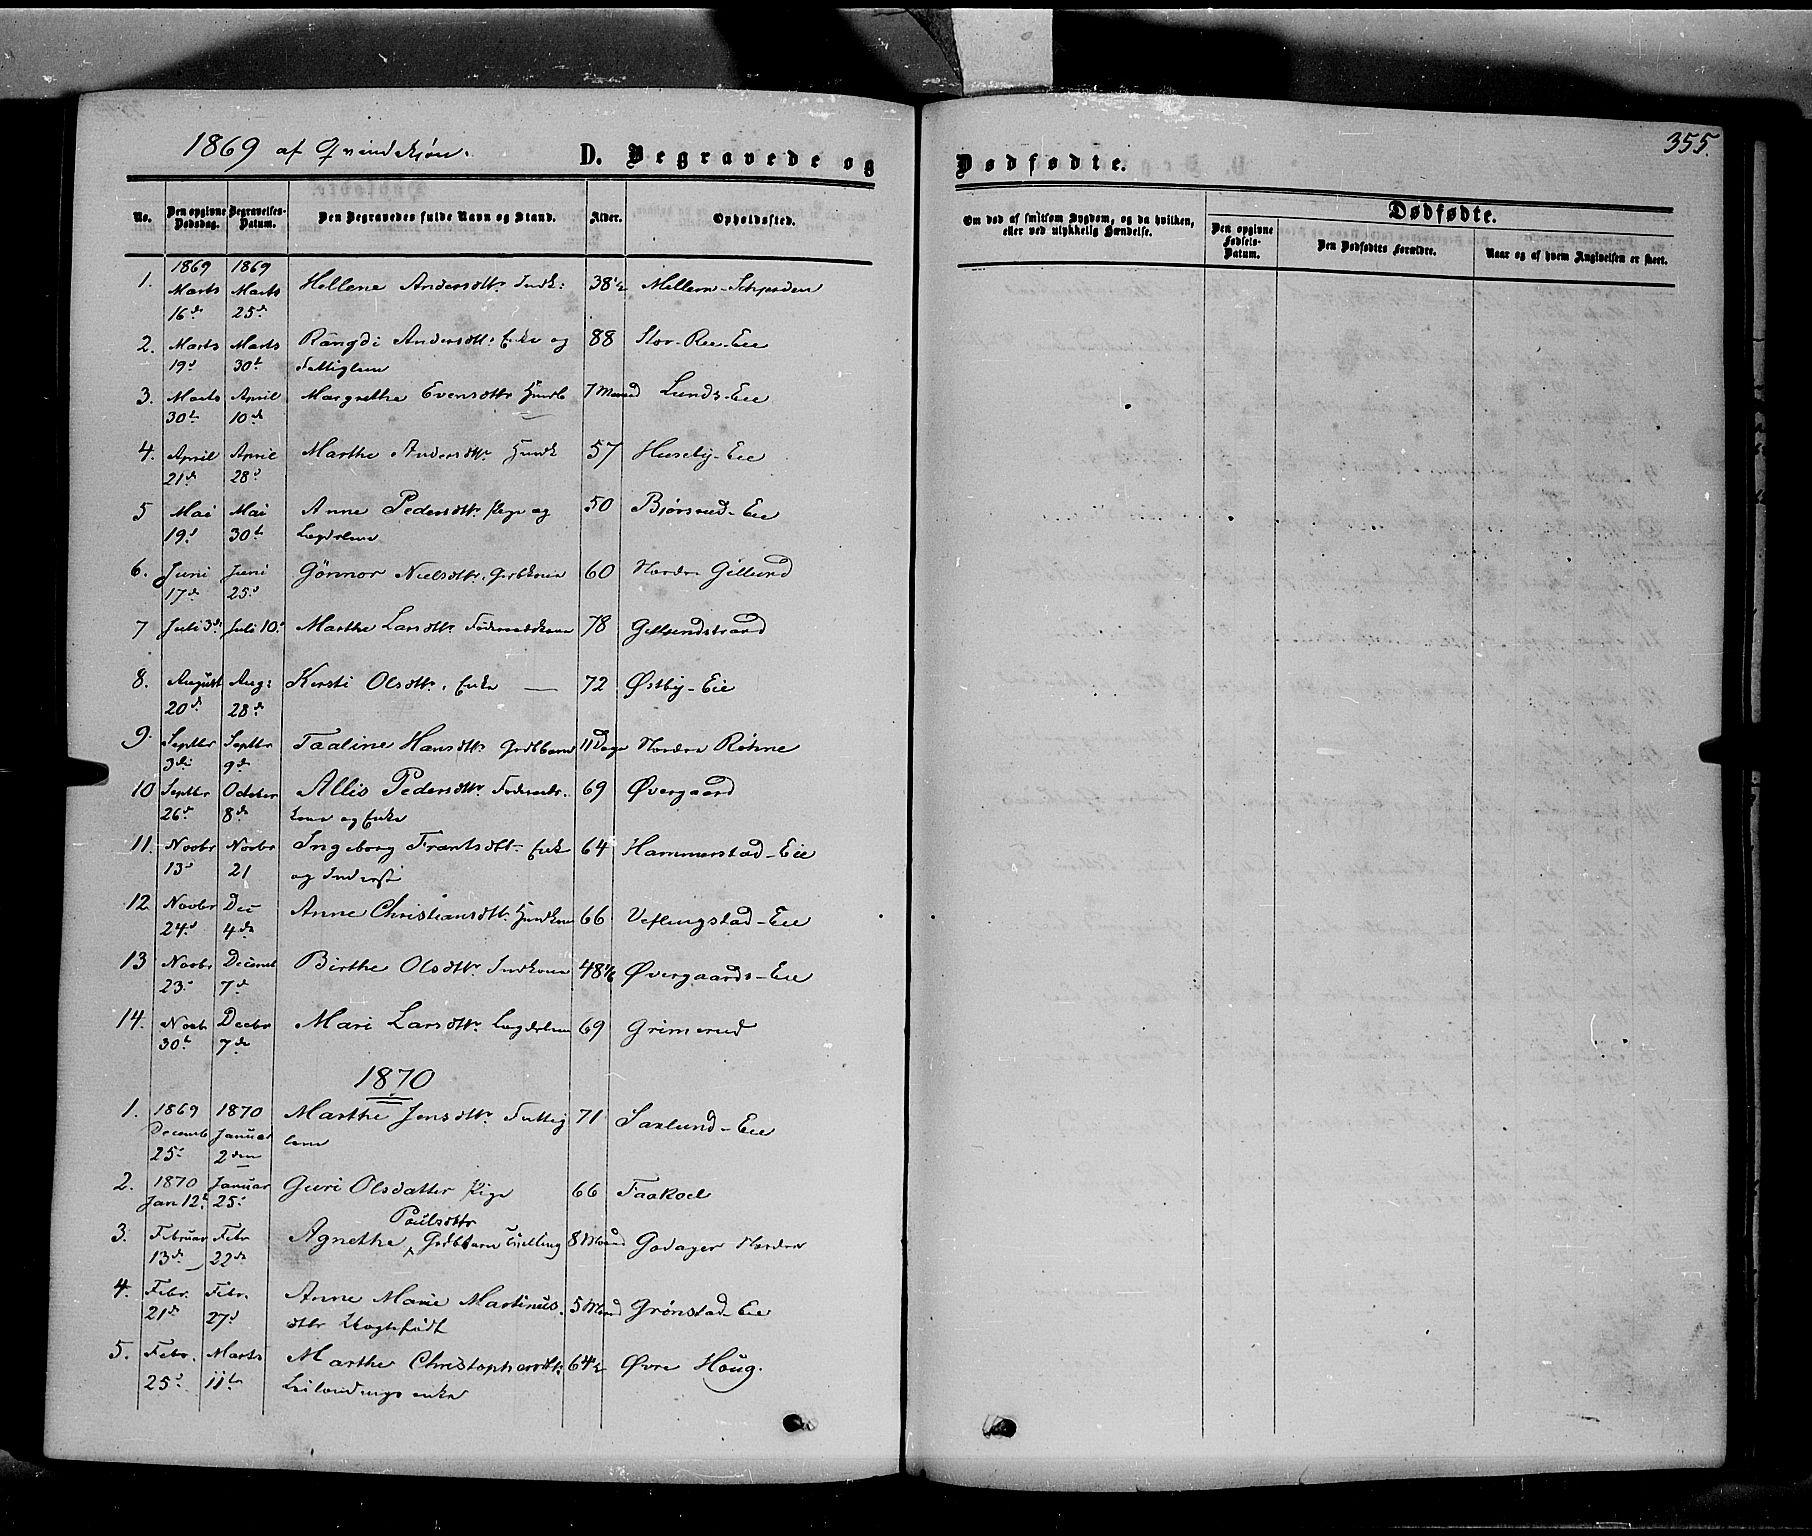 SAH, Stange prestekontor, K/L0013: Ministerialbok nr. 13, 1862-1879, s. 355